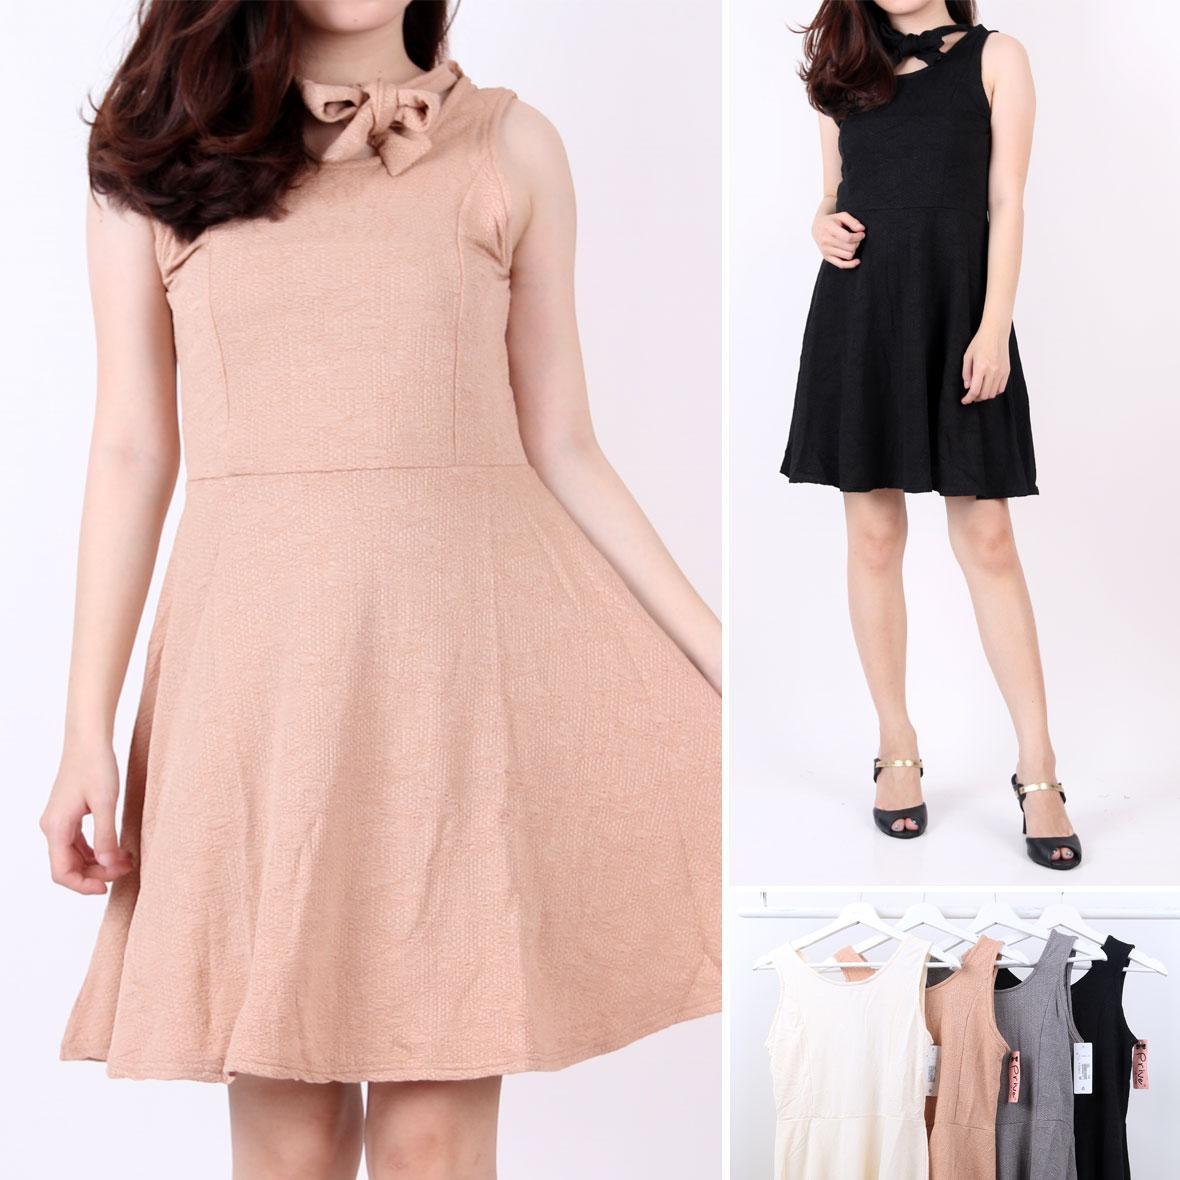 Oma Holley Fashion Speranza Mini Dress Sleeveless 4 Warna-Size M